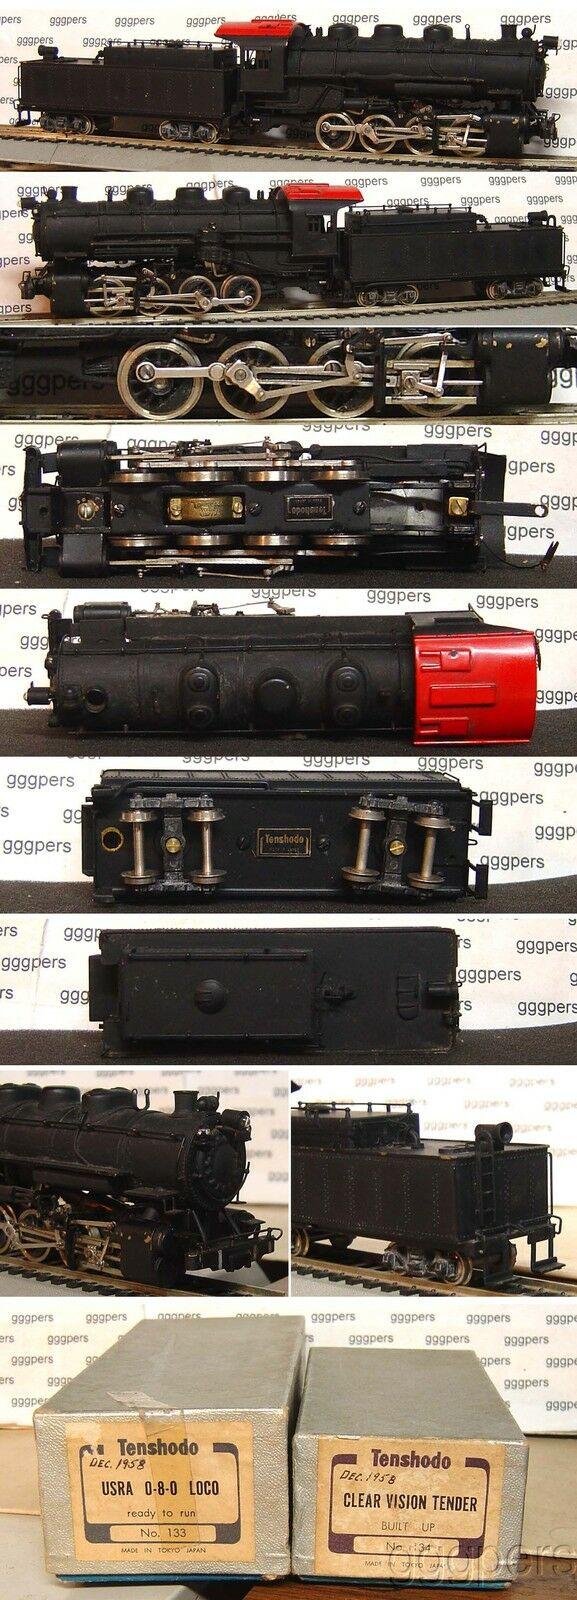 HO train TENSHODO PFM Brass Steam 0-8-0 Engine & Tender USRA No.133 134 adhm